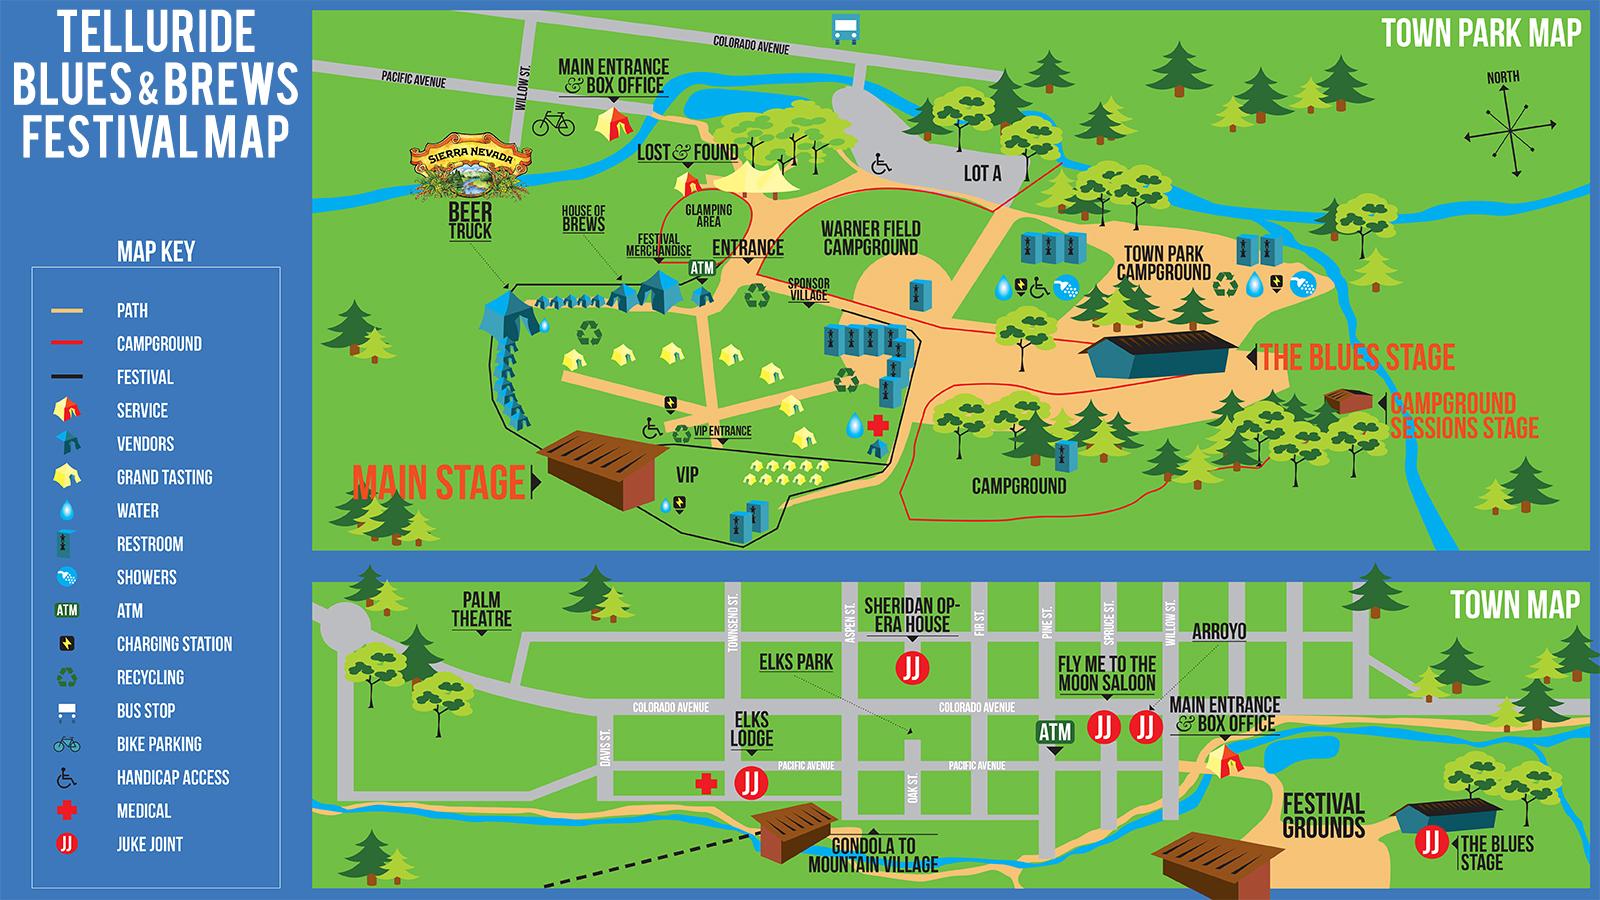 Telluride Blues & Brews Festival | 2016 Festival Map